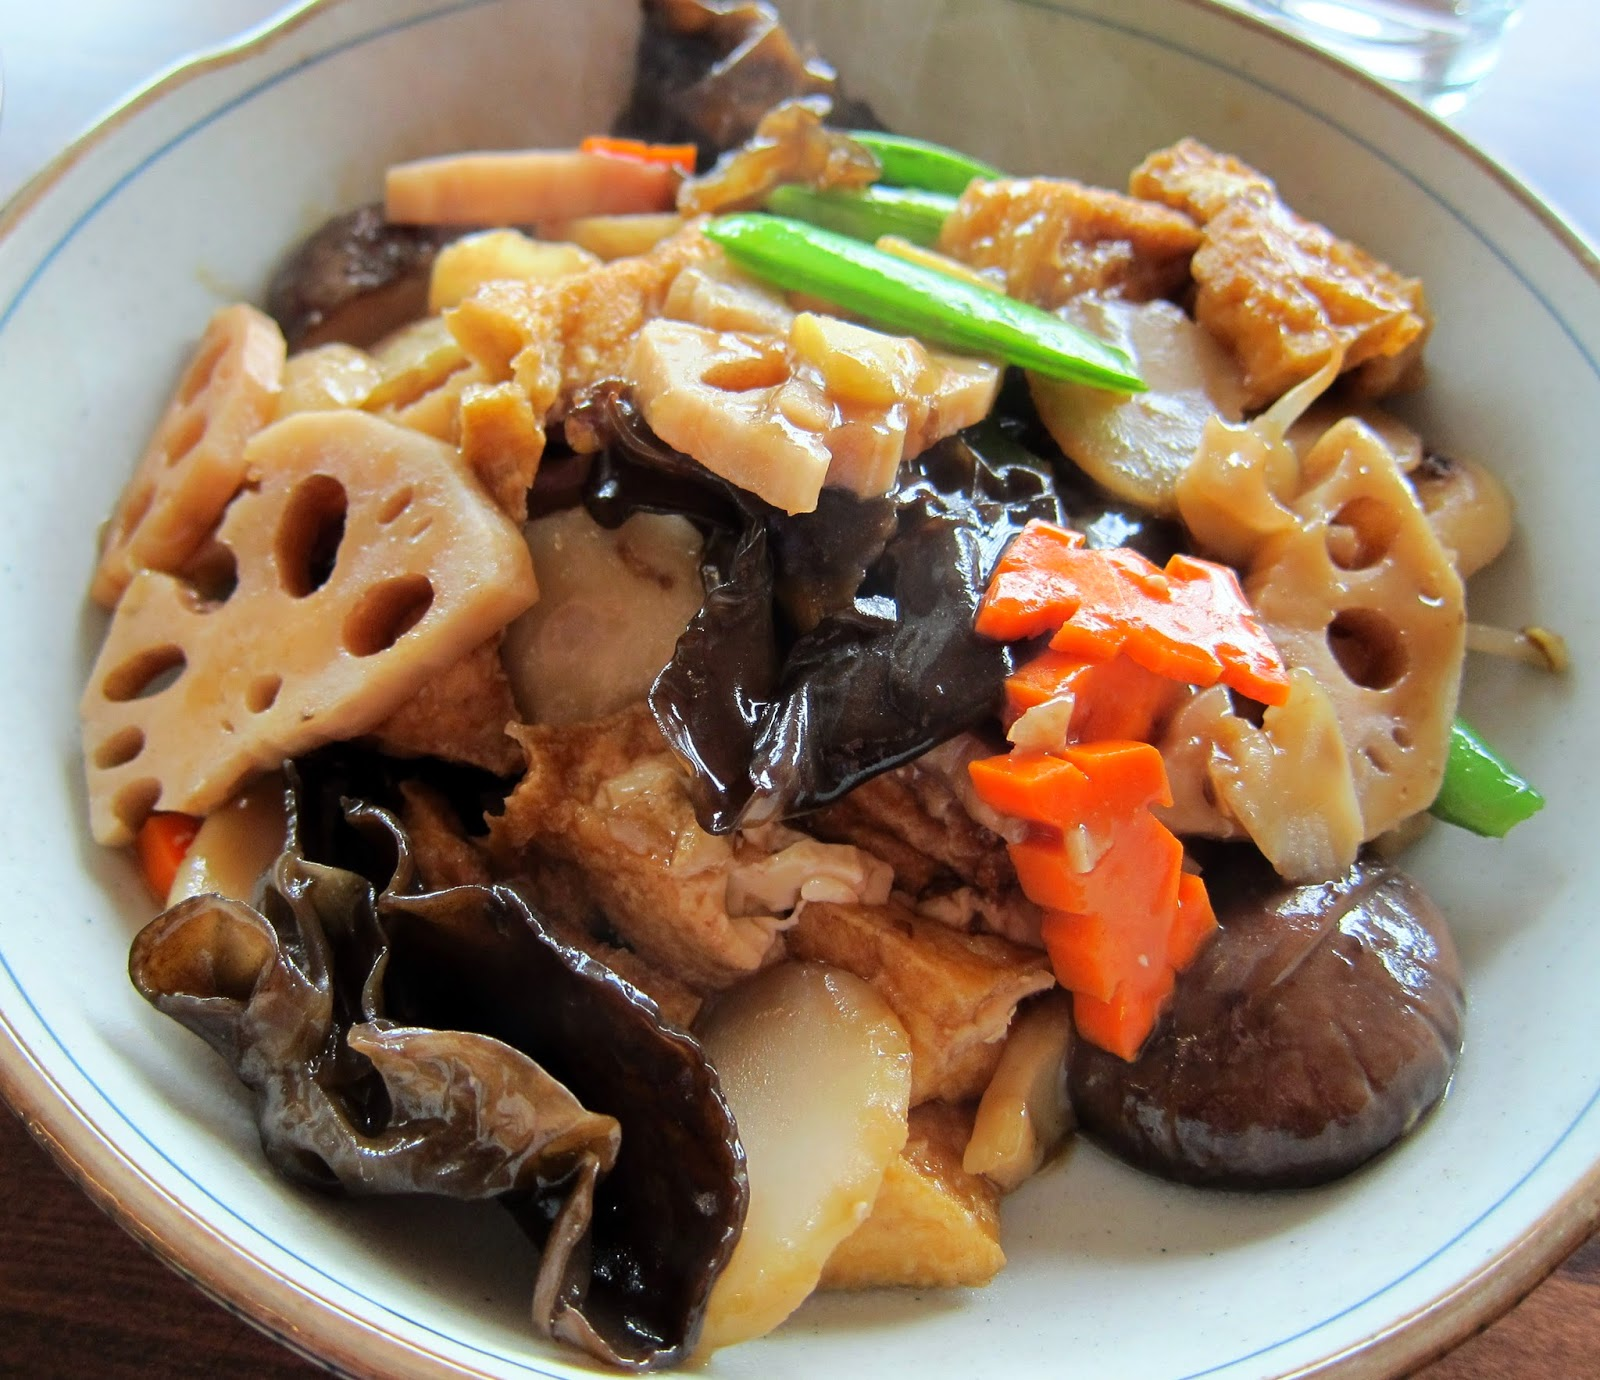 Wanderlust and words flavourful saskatoon june 2 2014 for Asian cuisine saskatoon